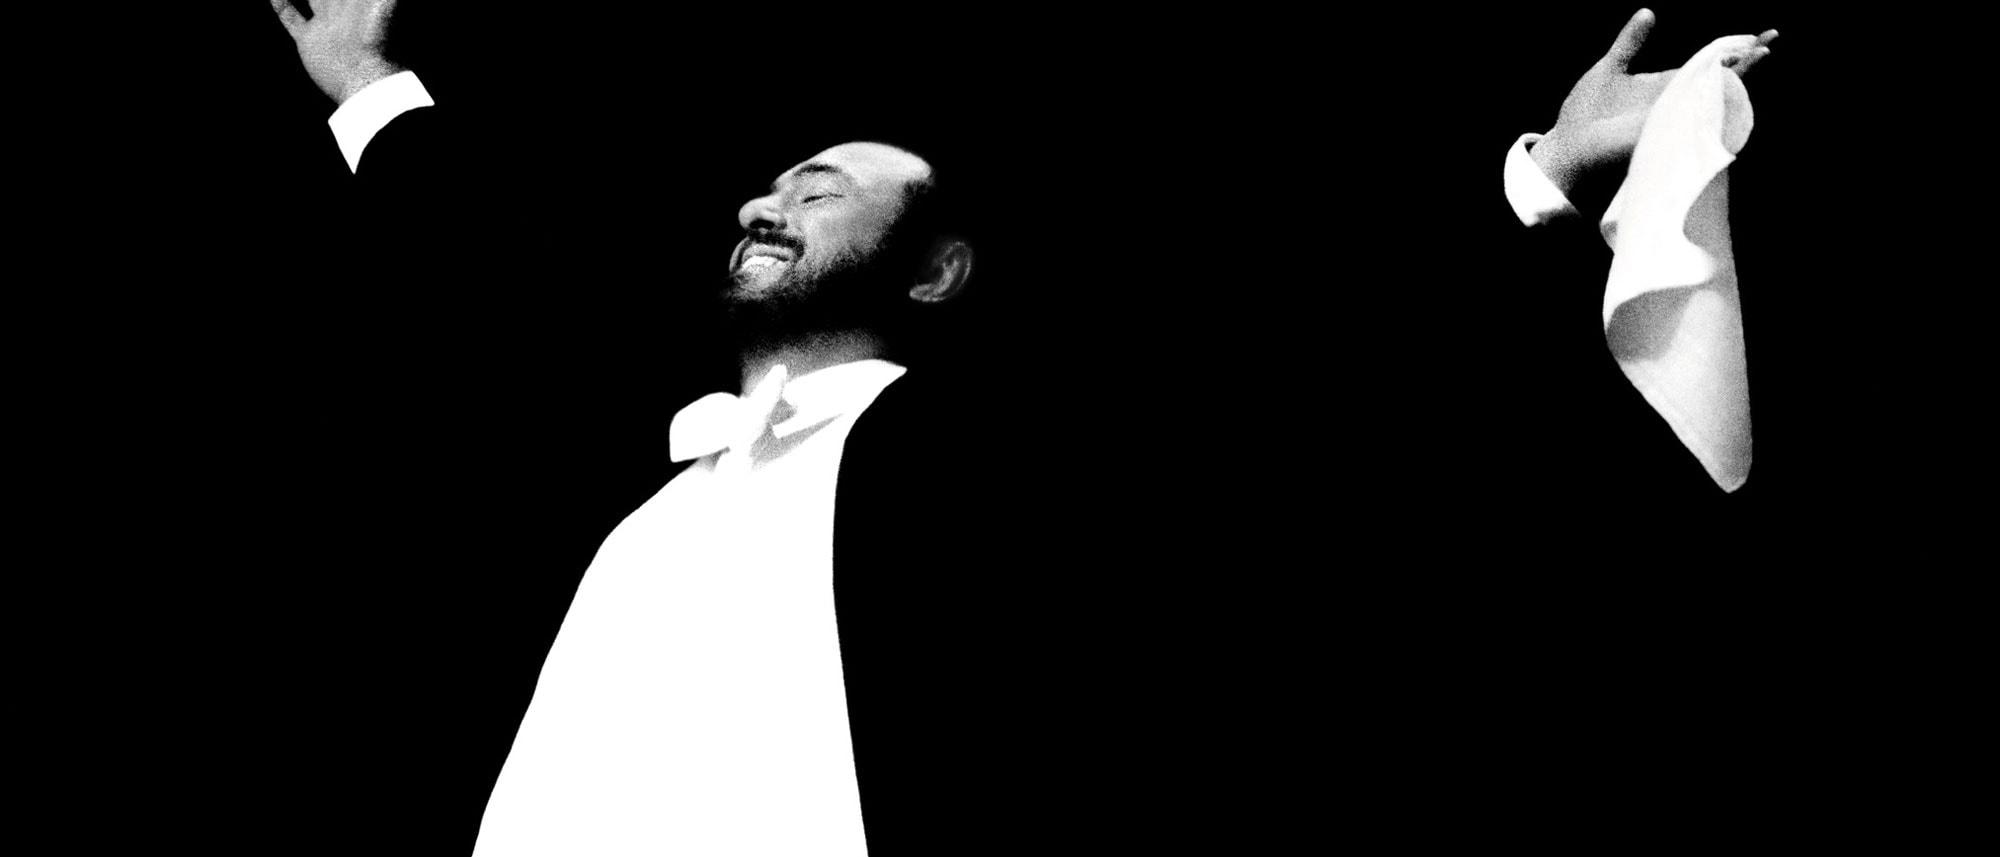 pavarotti_2Ds0Rd